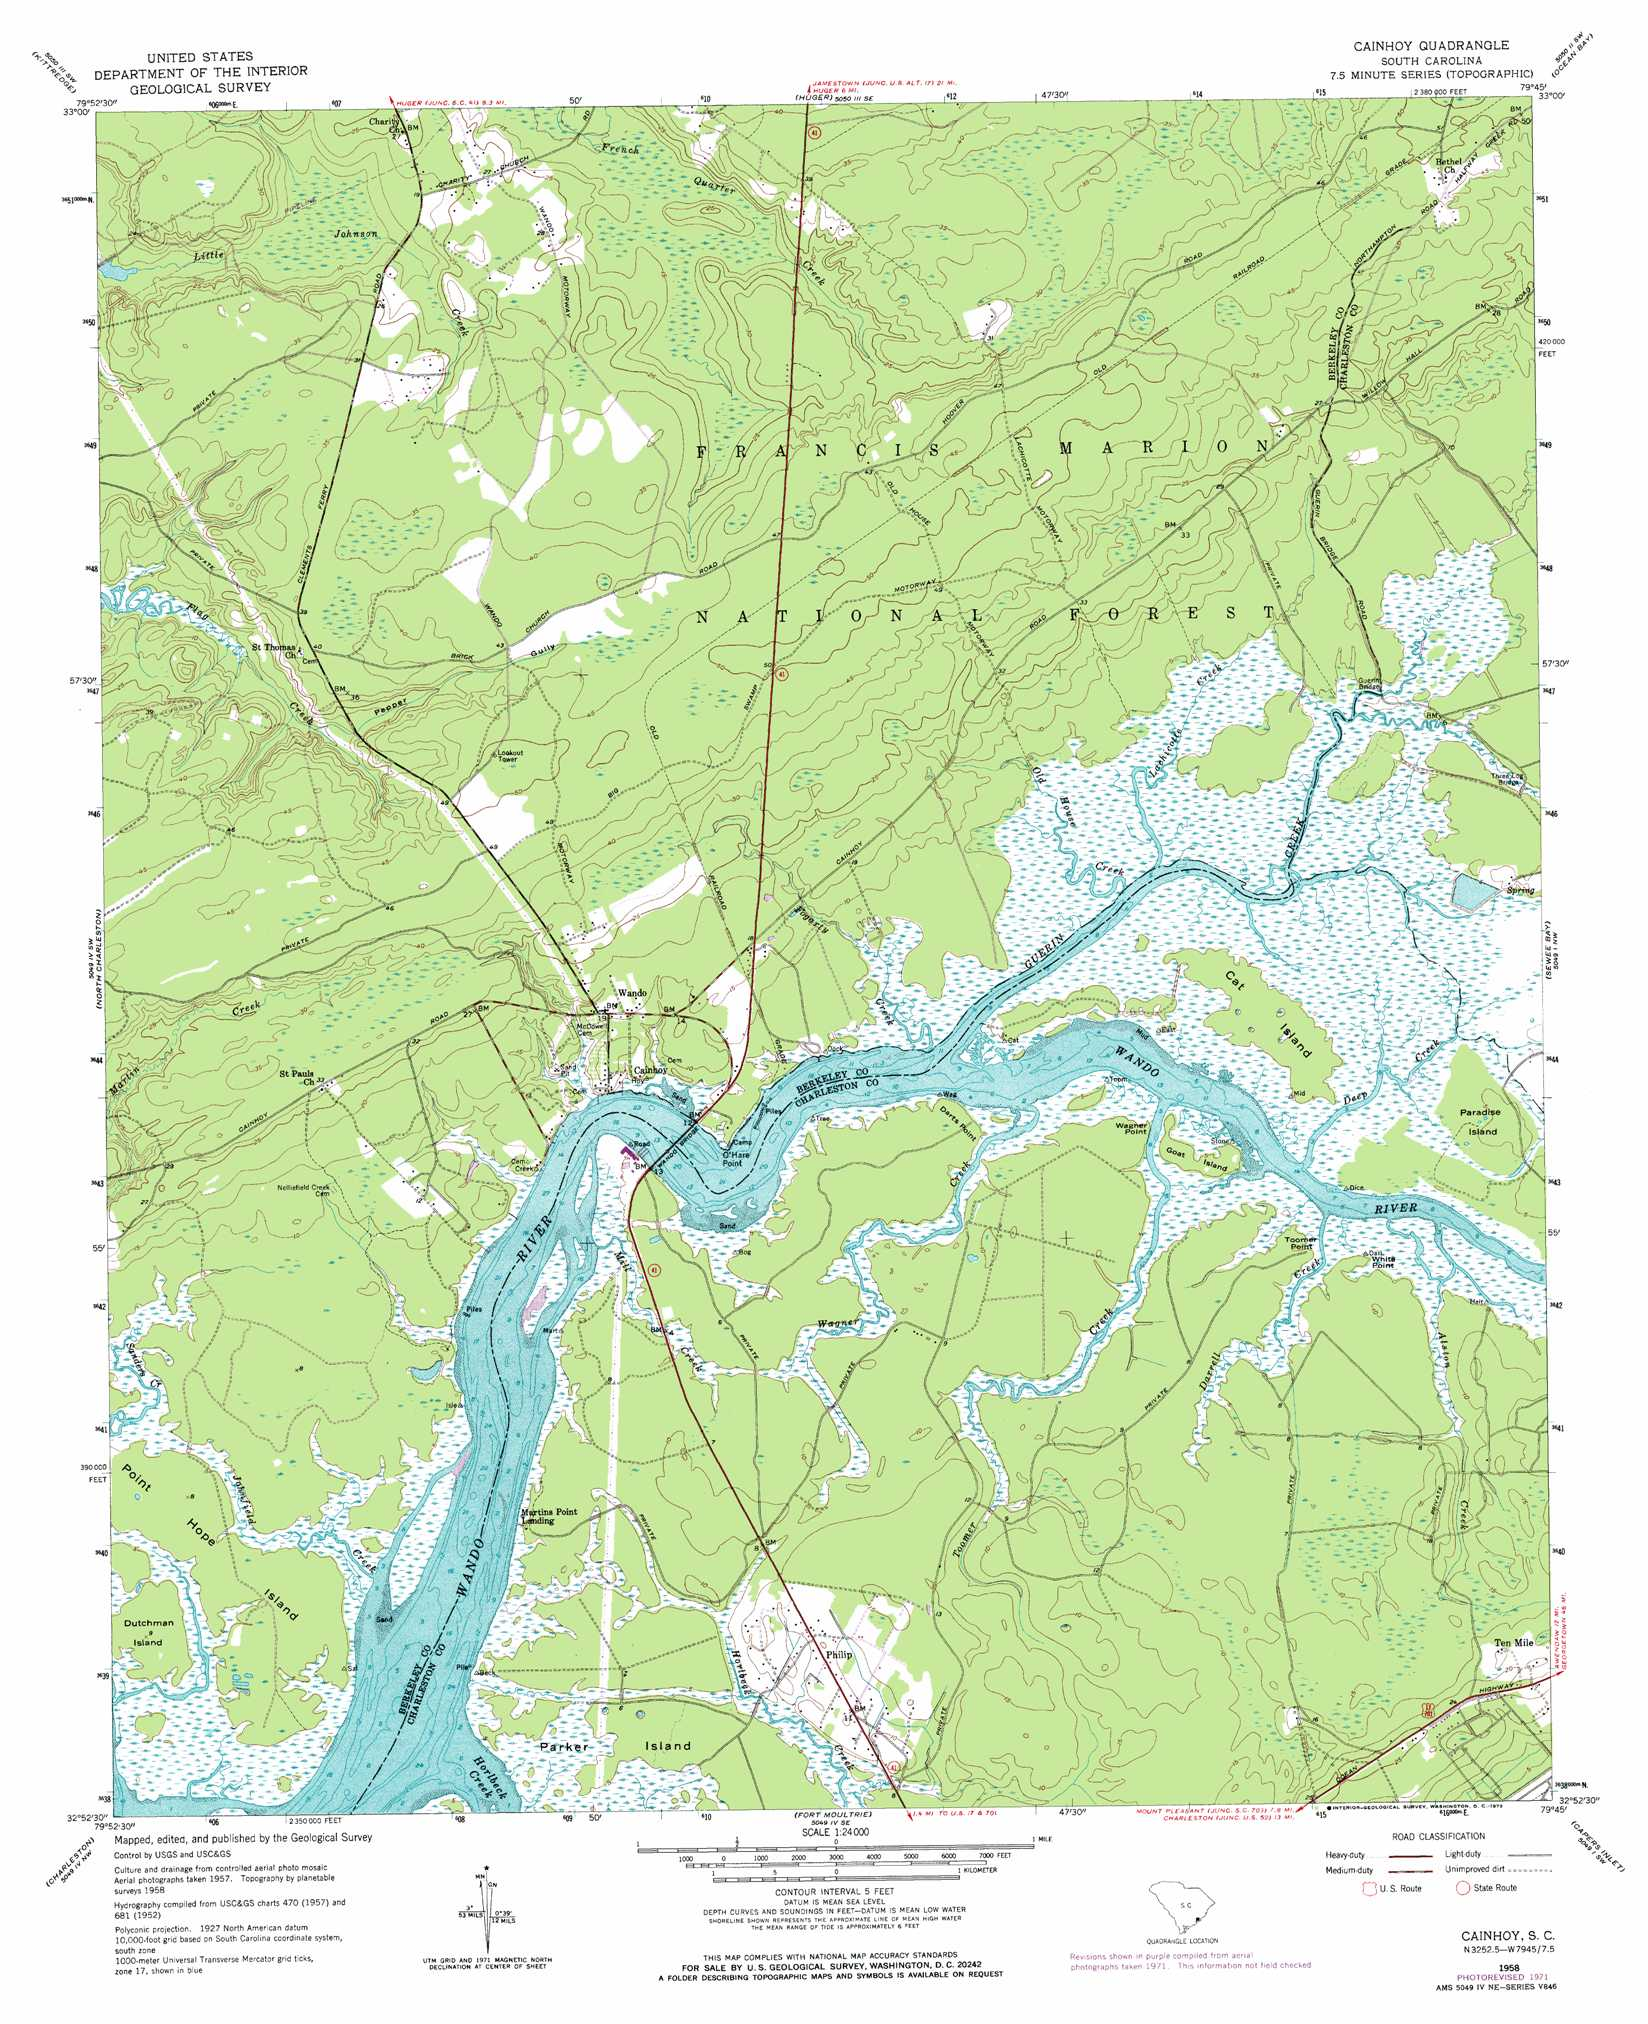 Cainhoy topographic map, SC - USGS Topo Quad 32079h7